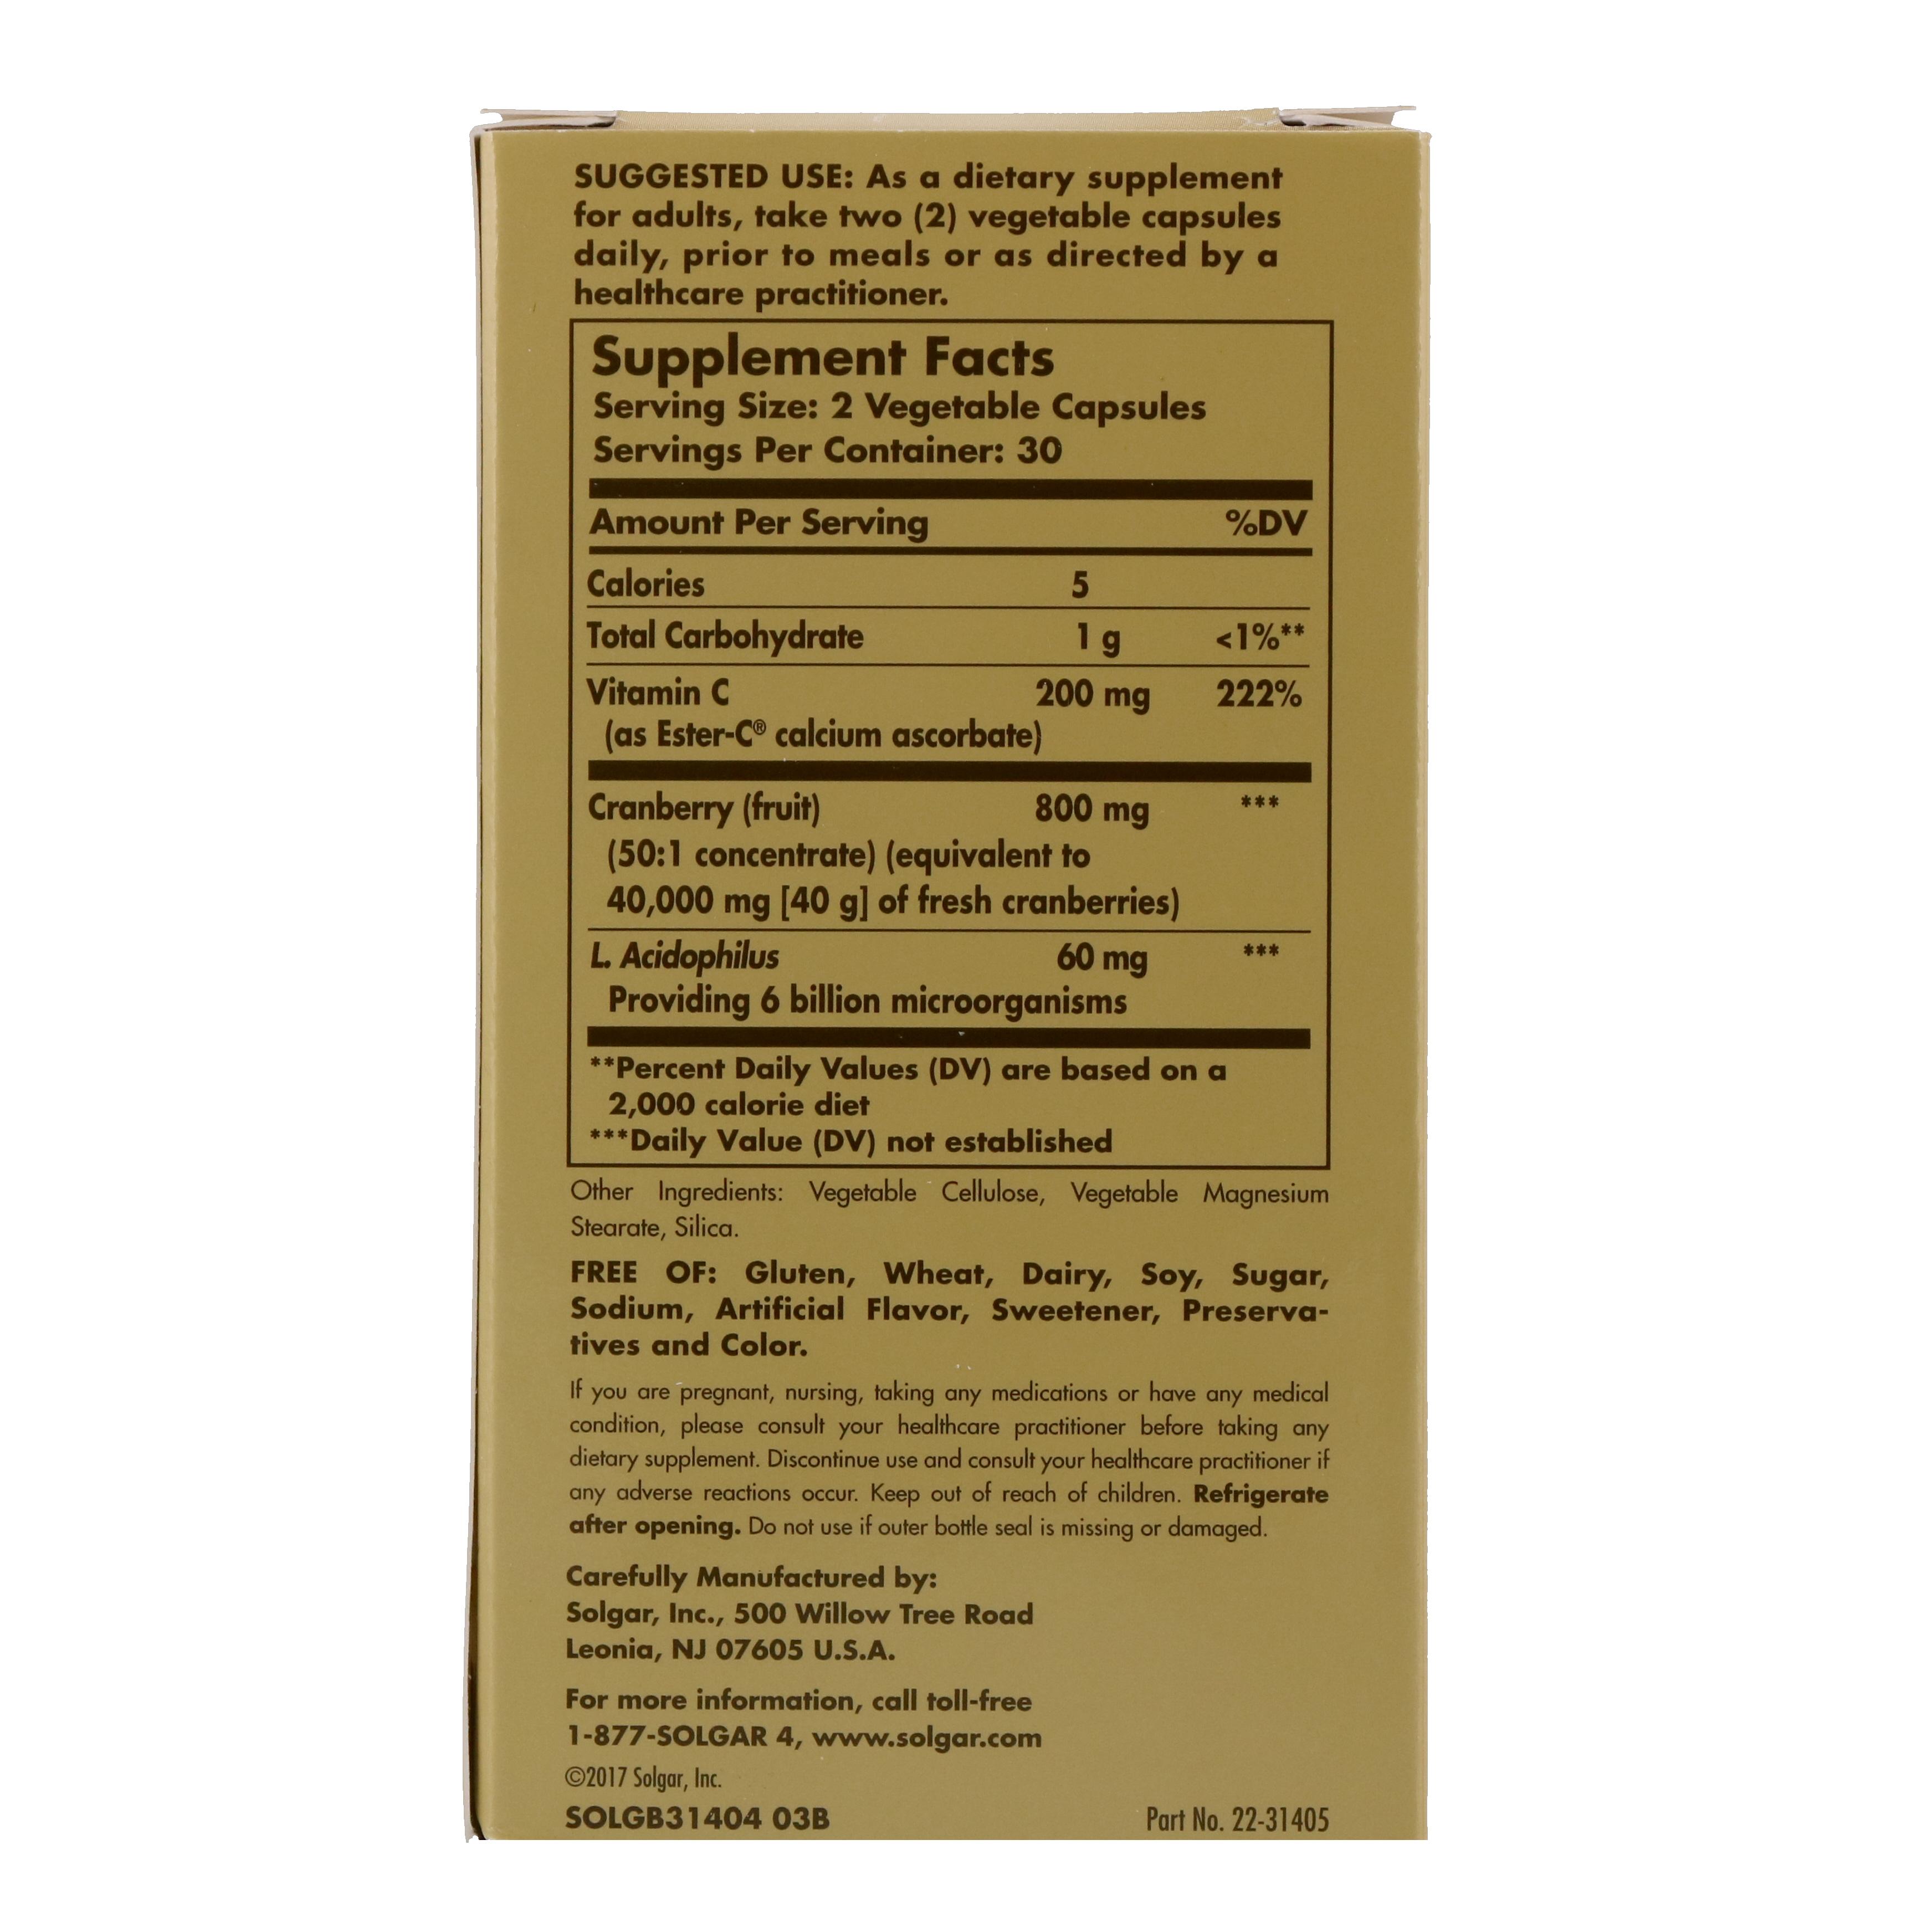 Solgar, Cran Flora, with Probiotics, 60 Vegetable Capsules - iHerb.com